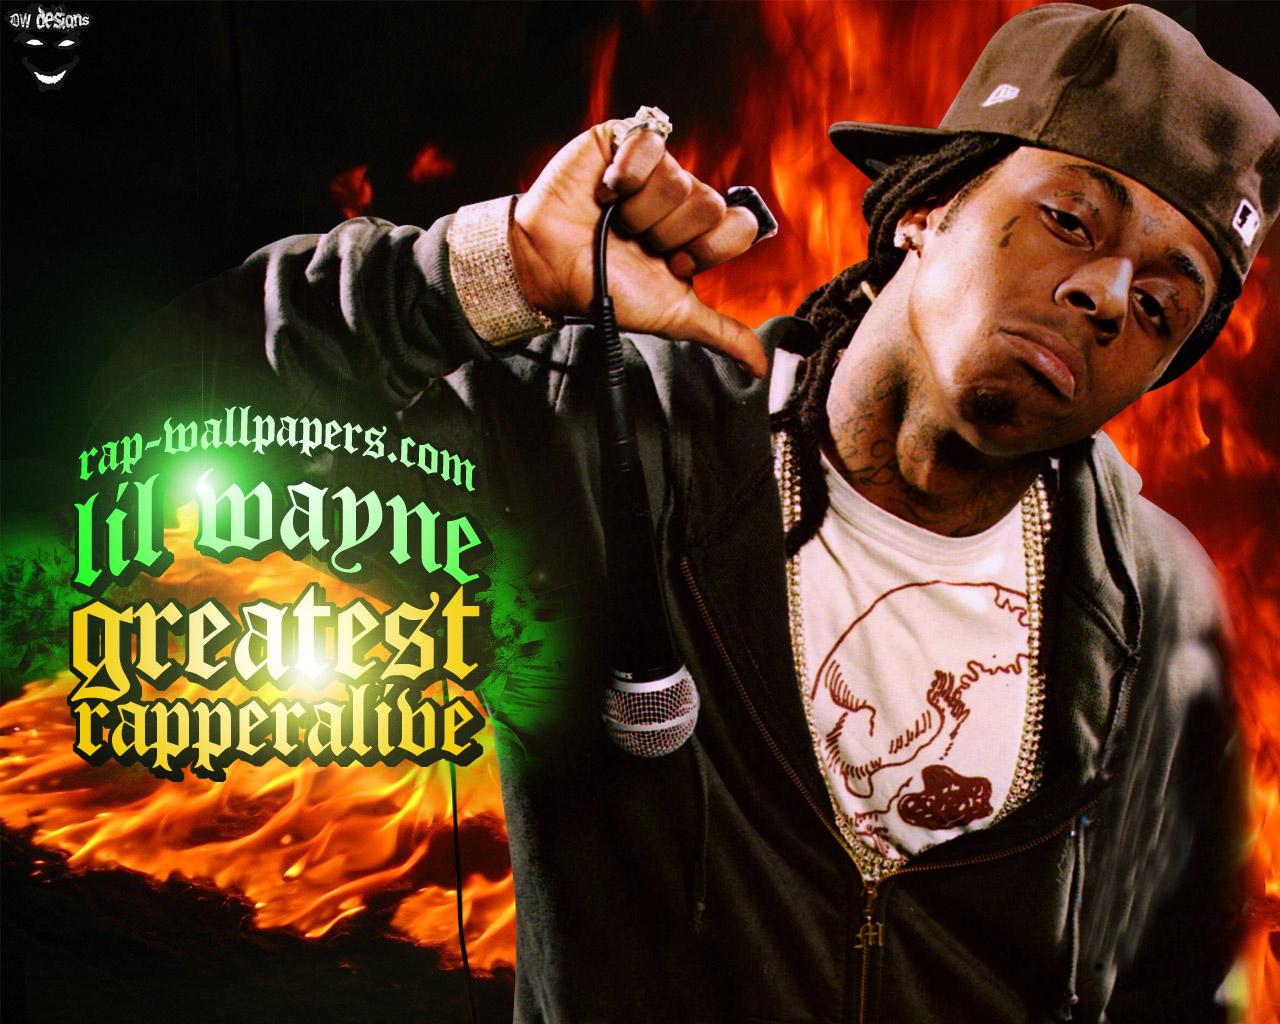 Lil Wayne Greatest Rapper Alive Rap Wallpapers 1280x1024